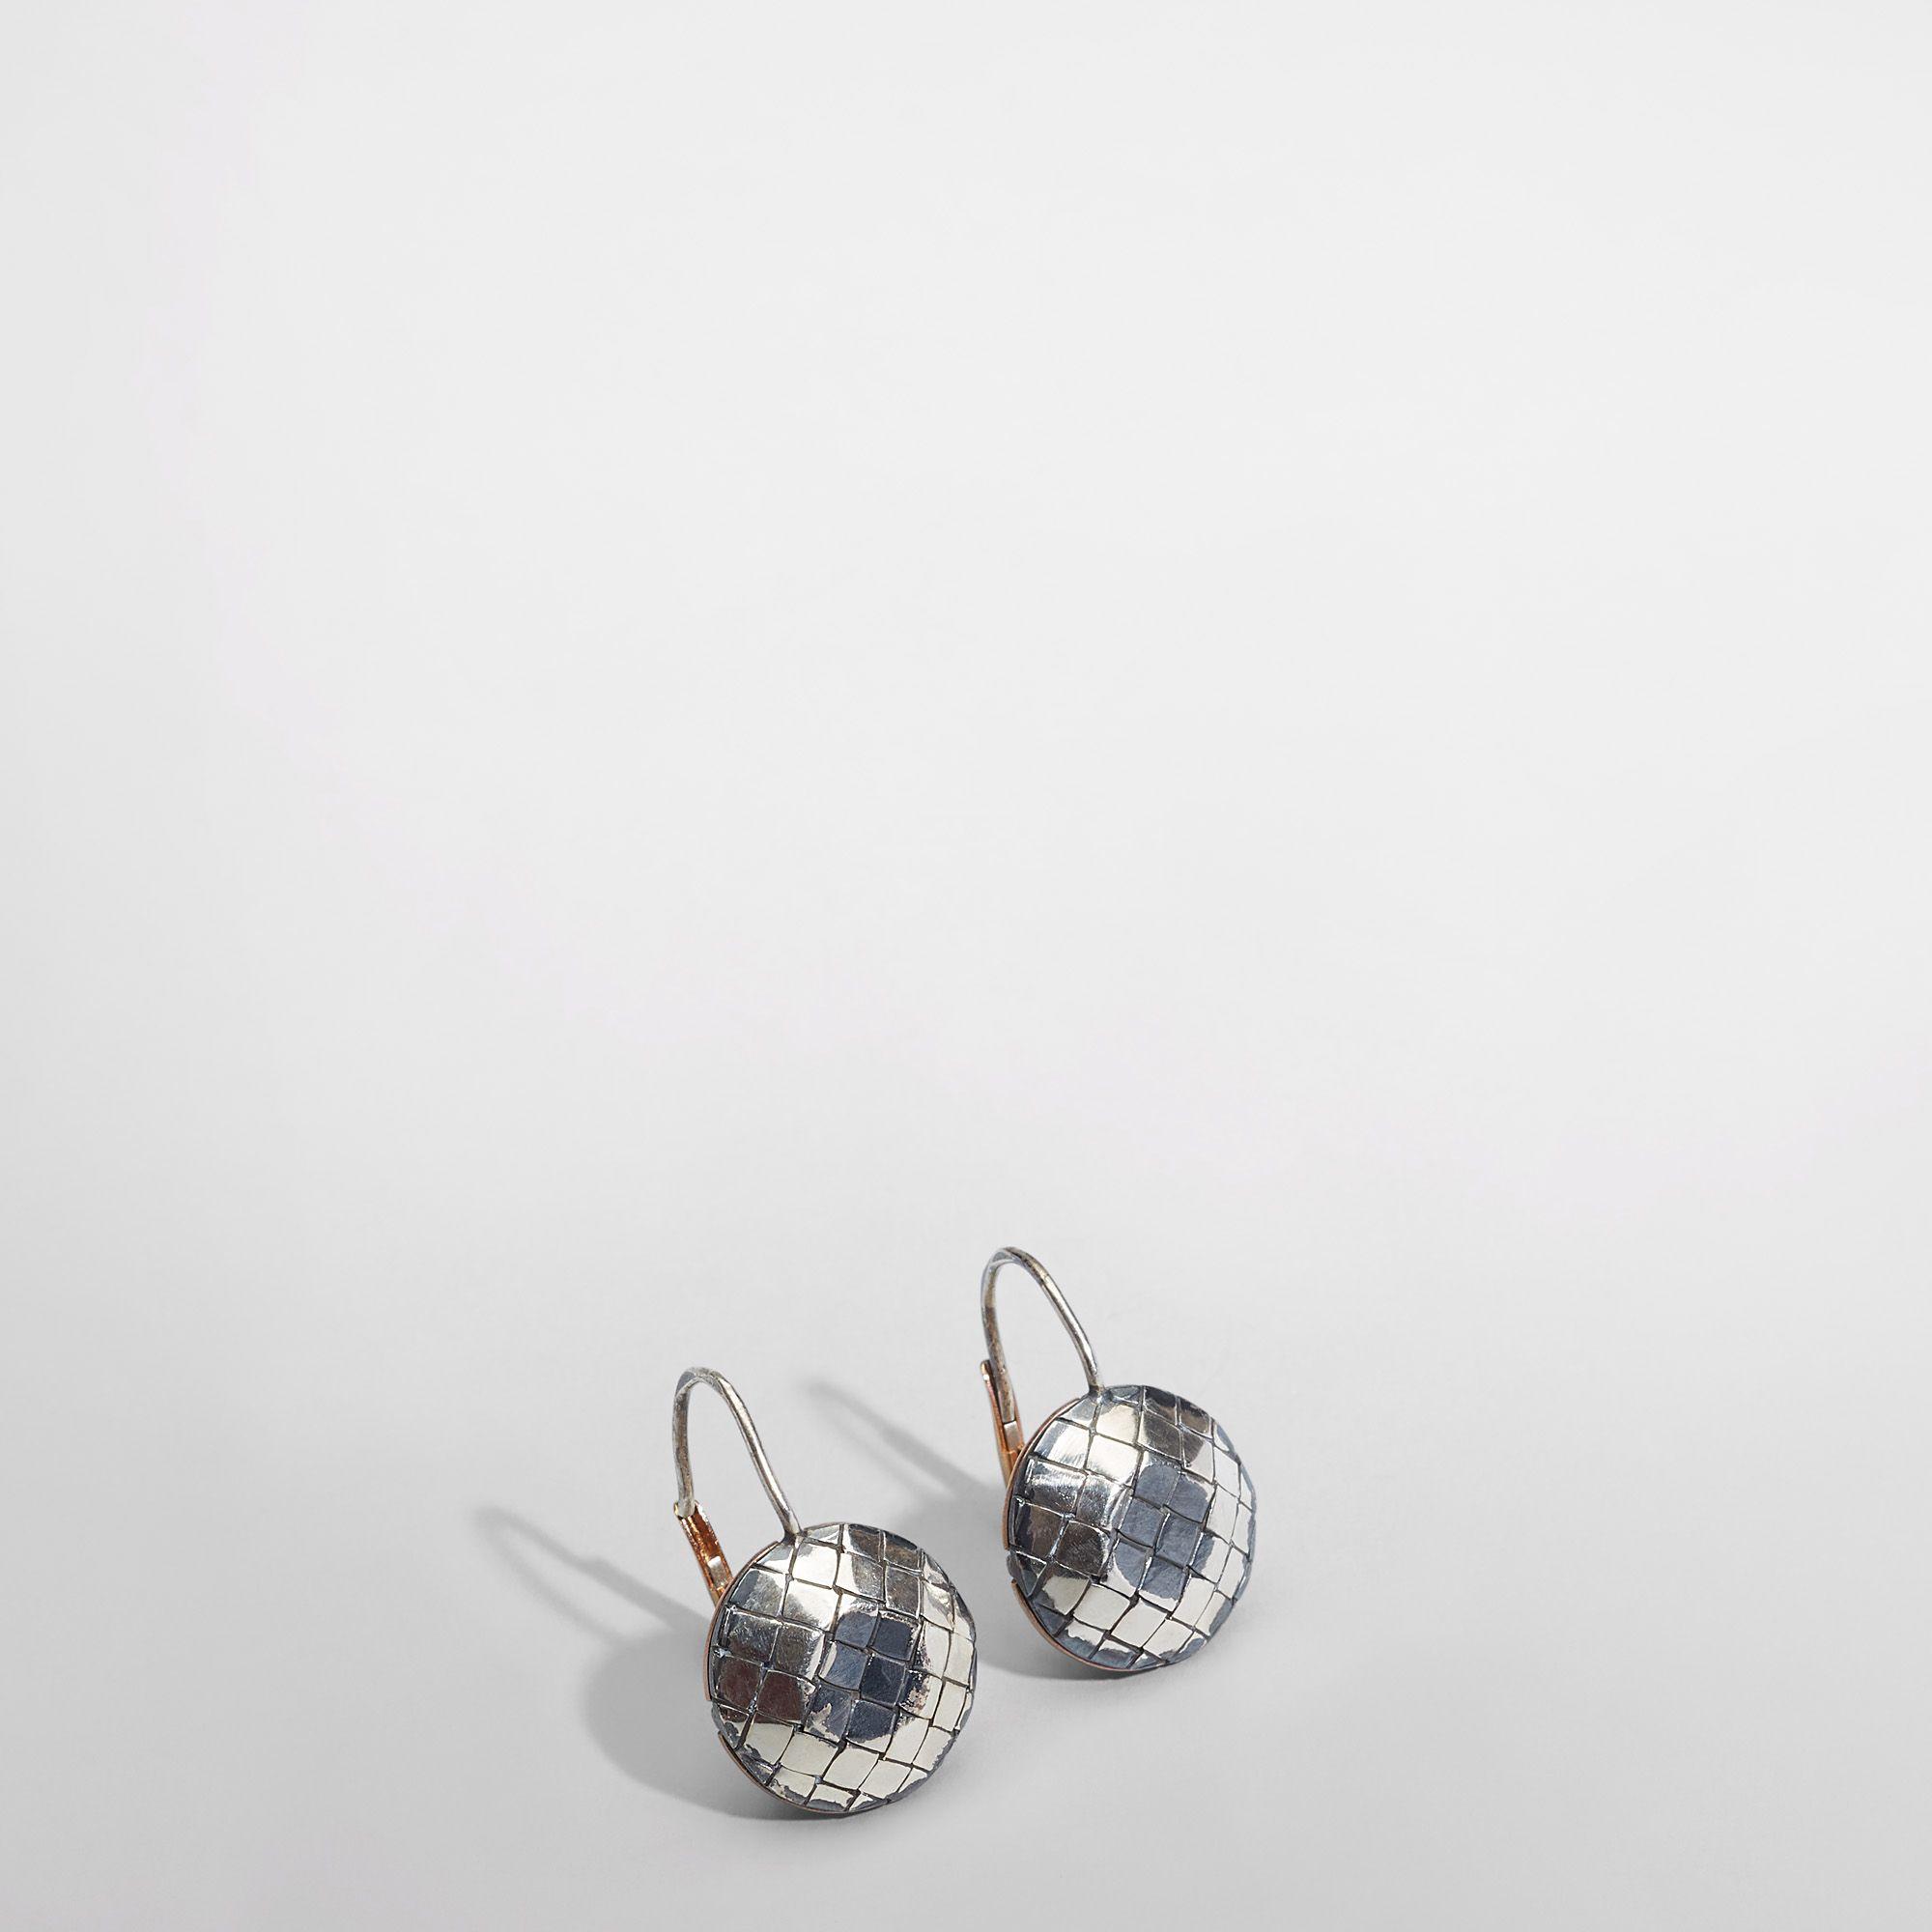 Bottega Veneta Oro Bruciato Intreccio Svanito Silver Earings